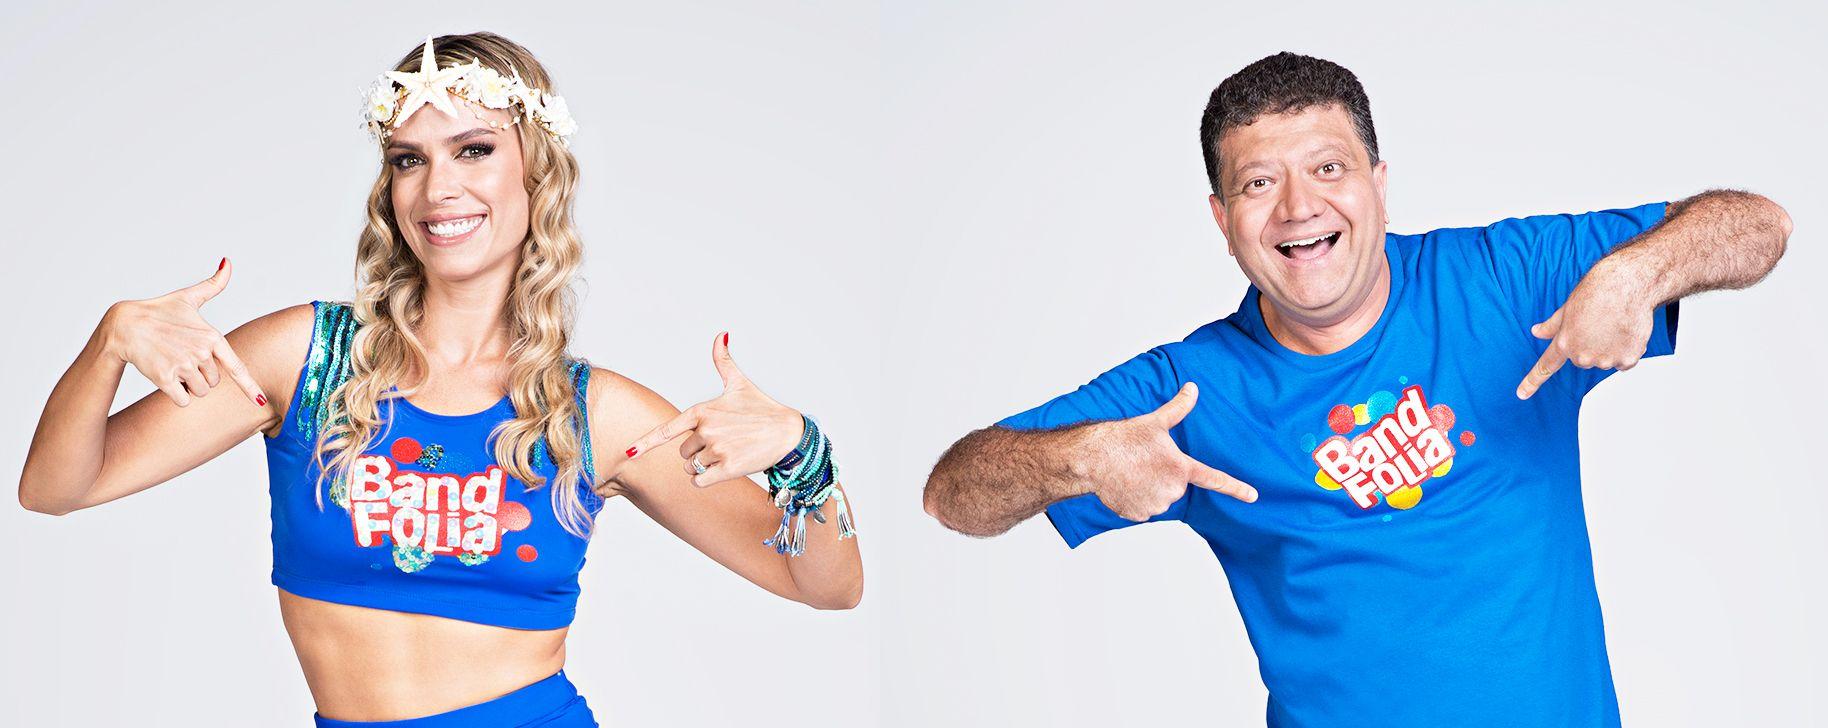 Betinho e Lígia Mendes